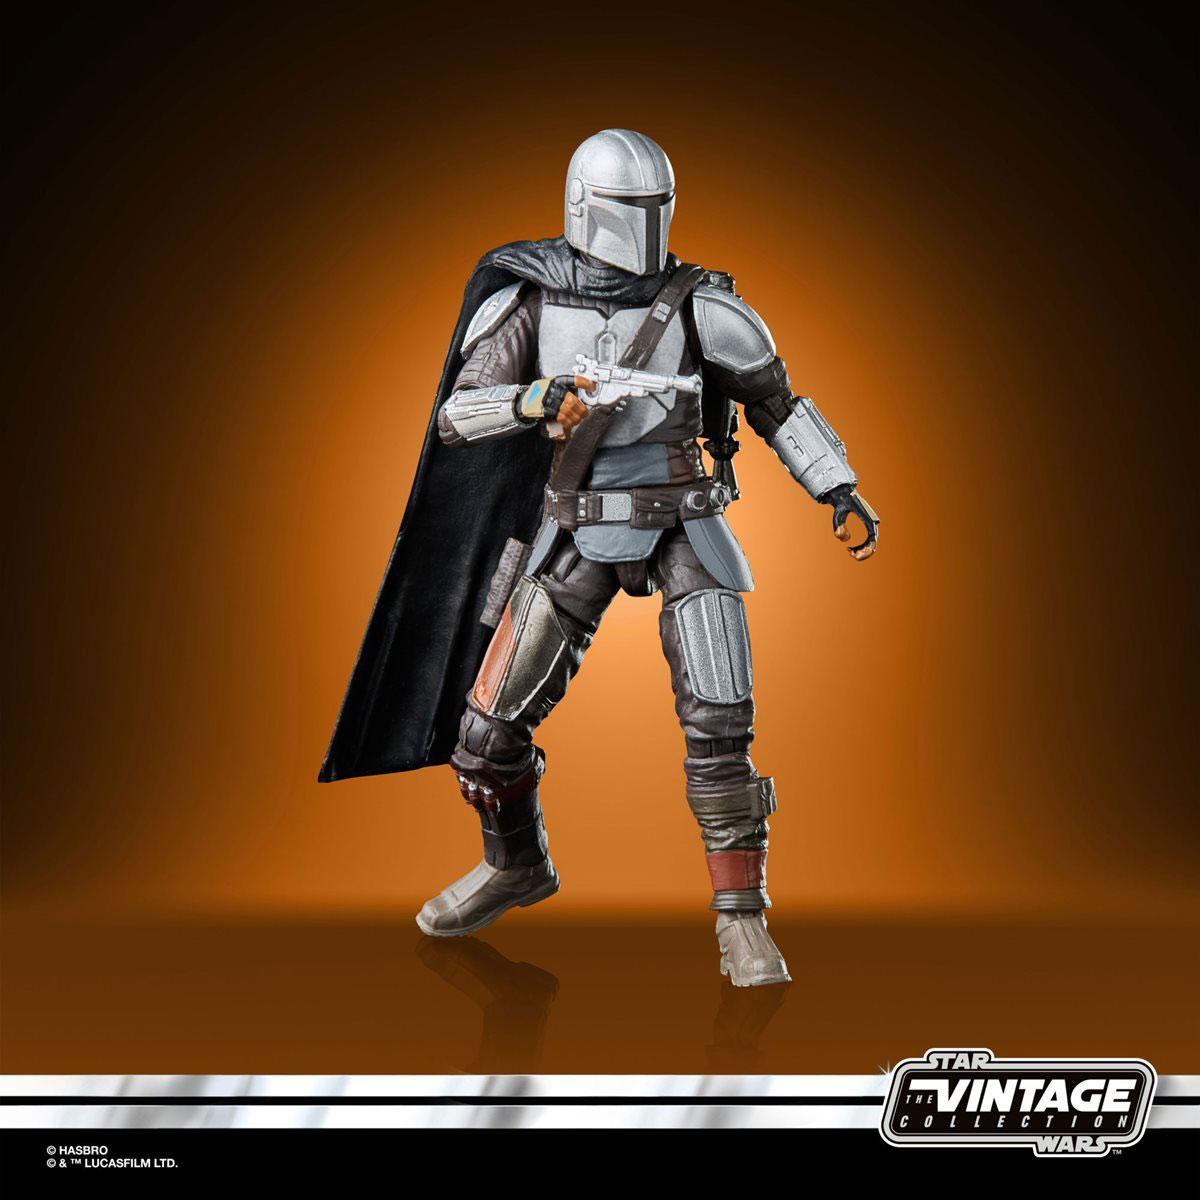 star-wars-vintage-collection-mandalorian-in-beskar-armor-action-figure-5